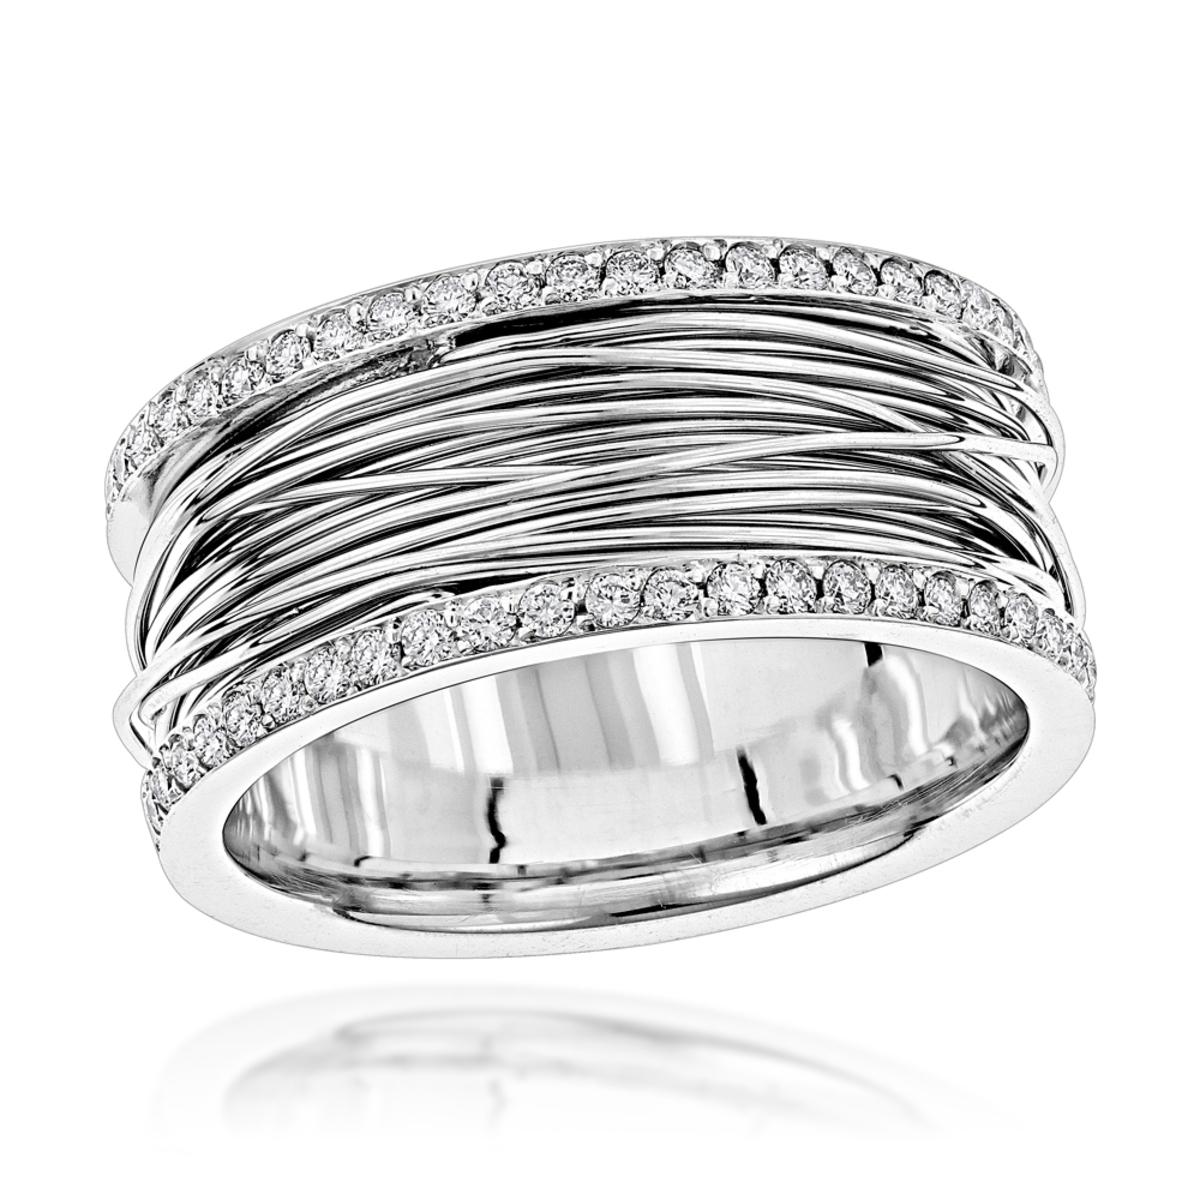 14K Gold Unique Diamond Wedding Ring White Rose Yellow Gold 1 Carat Band